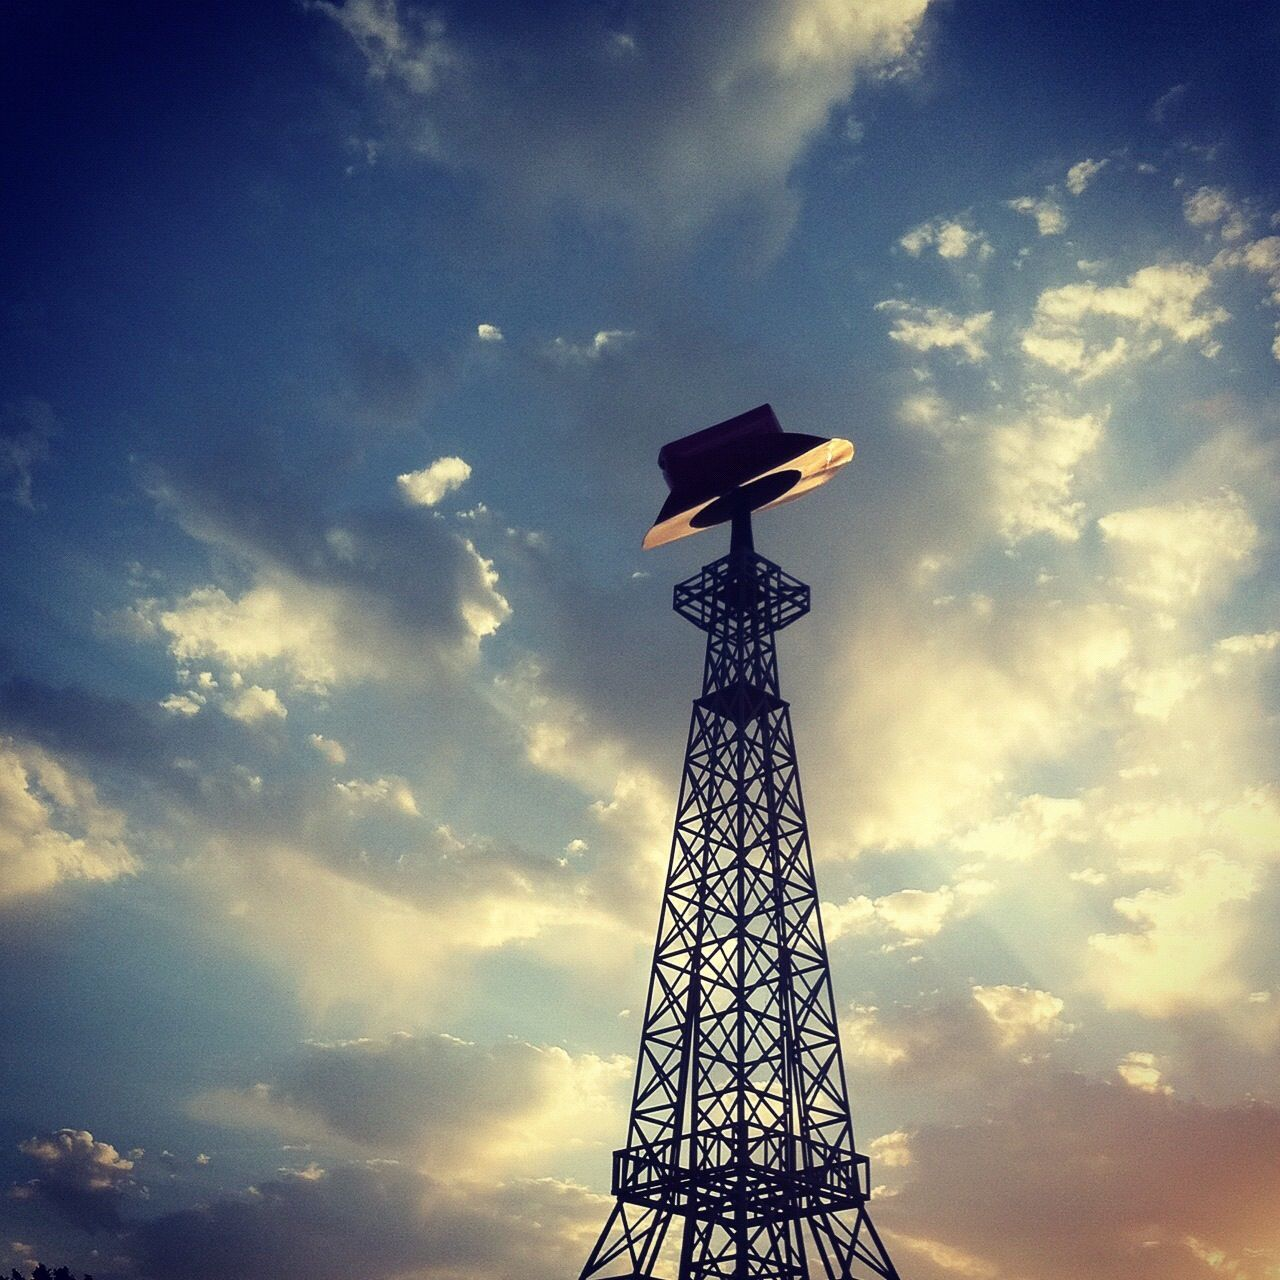 Paris, Texas Eiffel Tower Paris texas, Paris, Eiffel tower